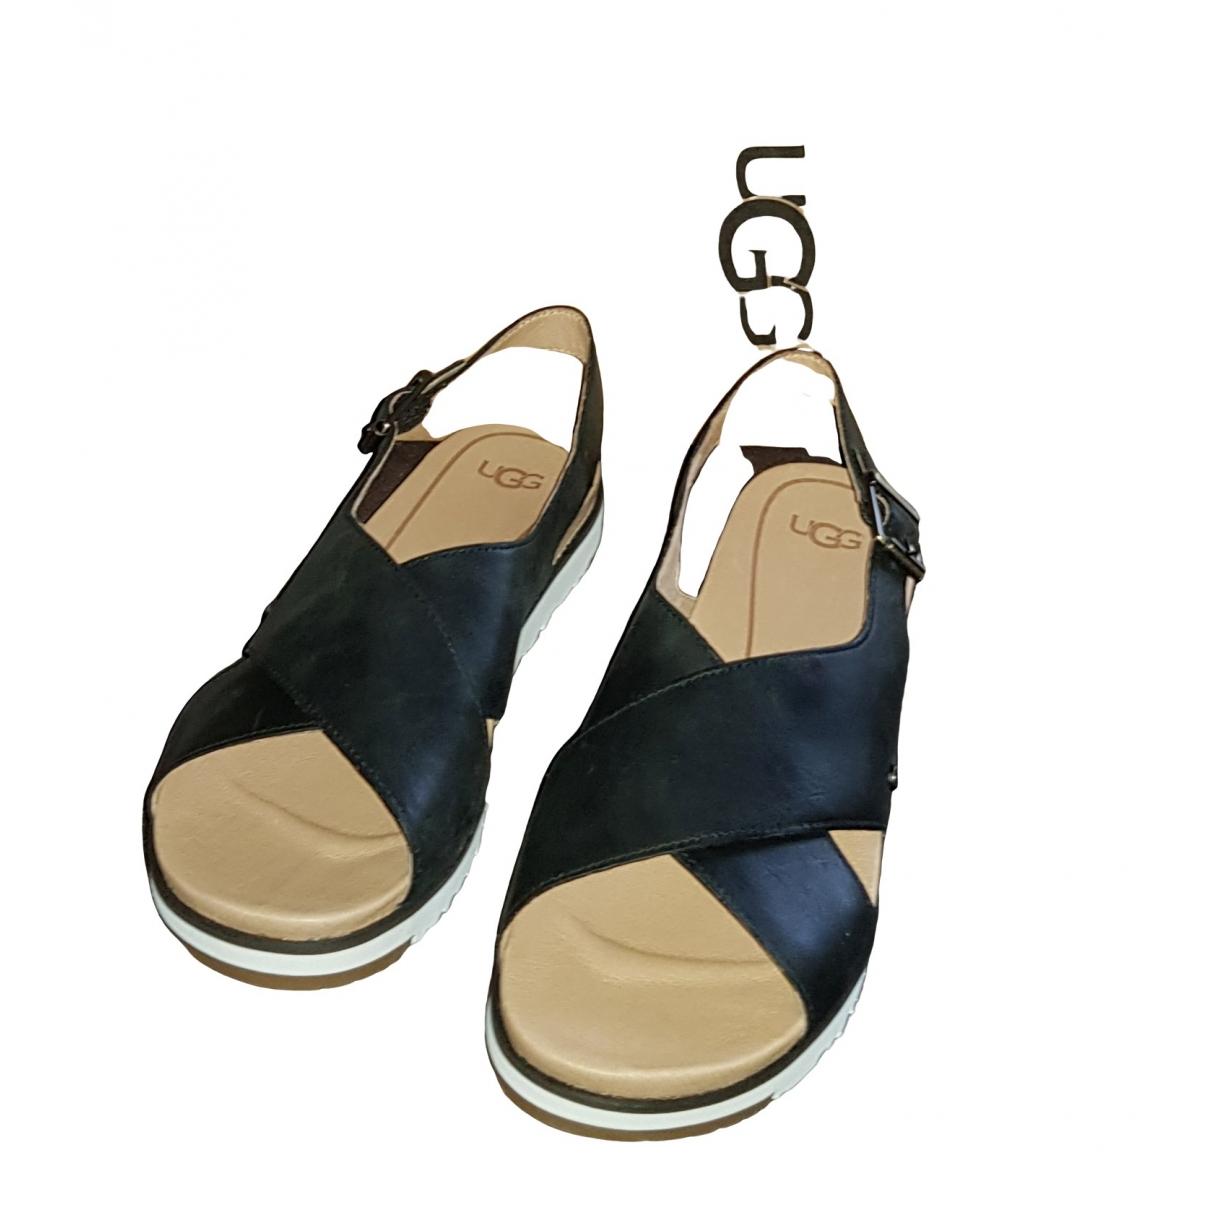 Ugg \N Black Leather Sandals for Women 39 EU